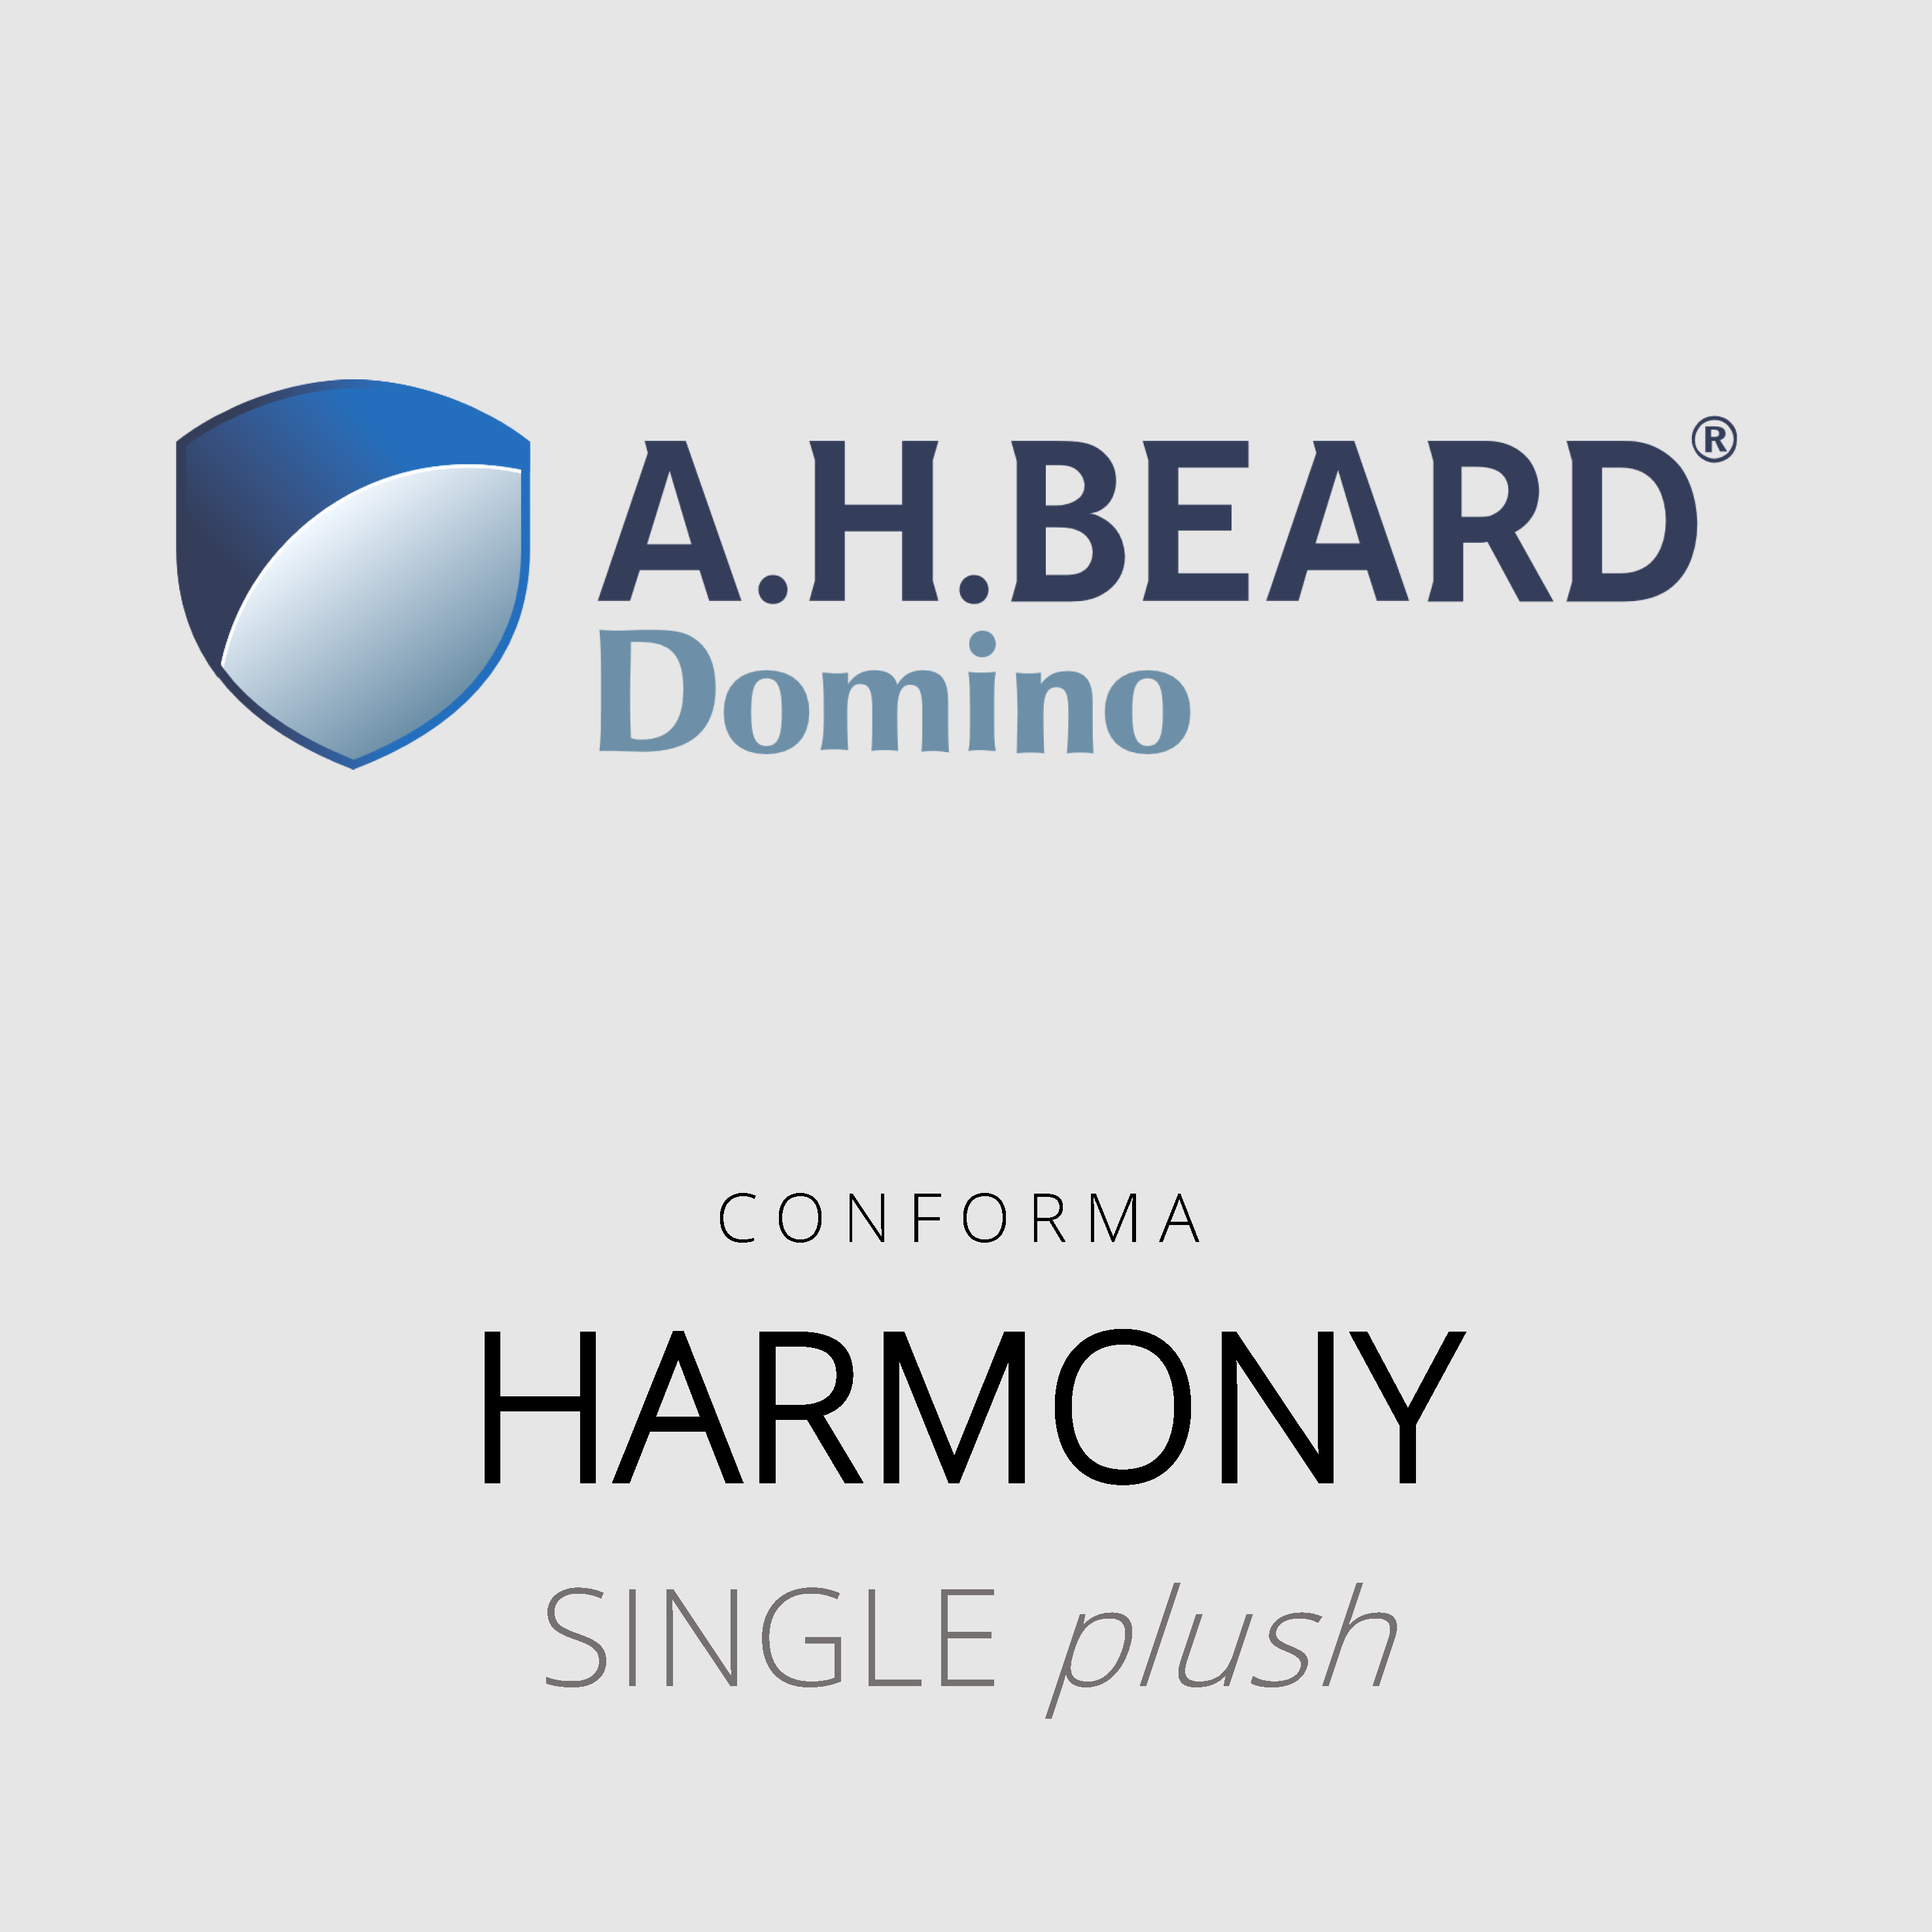 AH Beard Domino – Harmony – Conforma – Single Plush Mattress